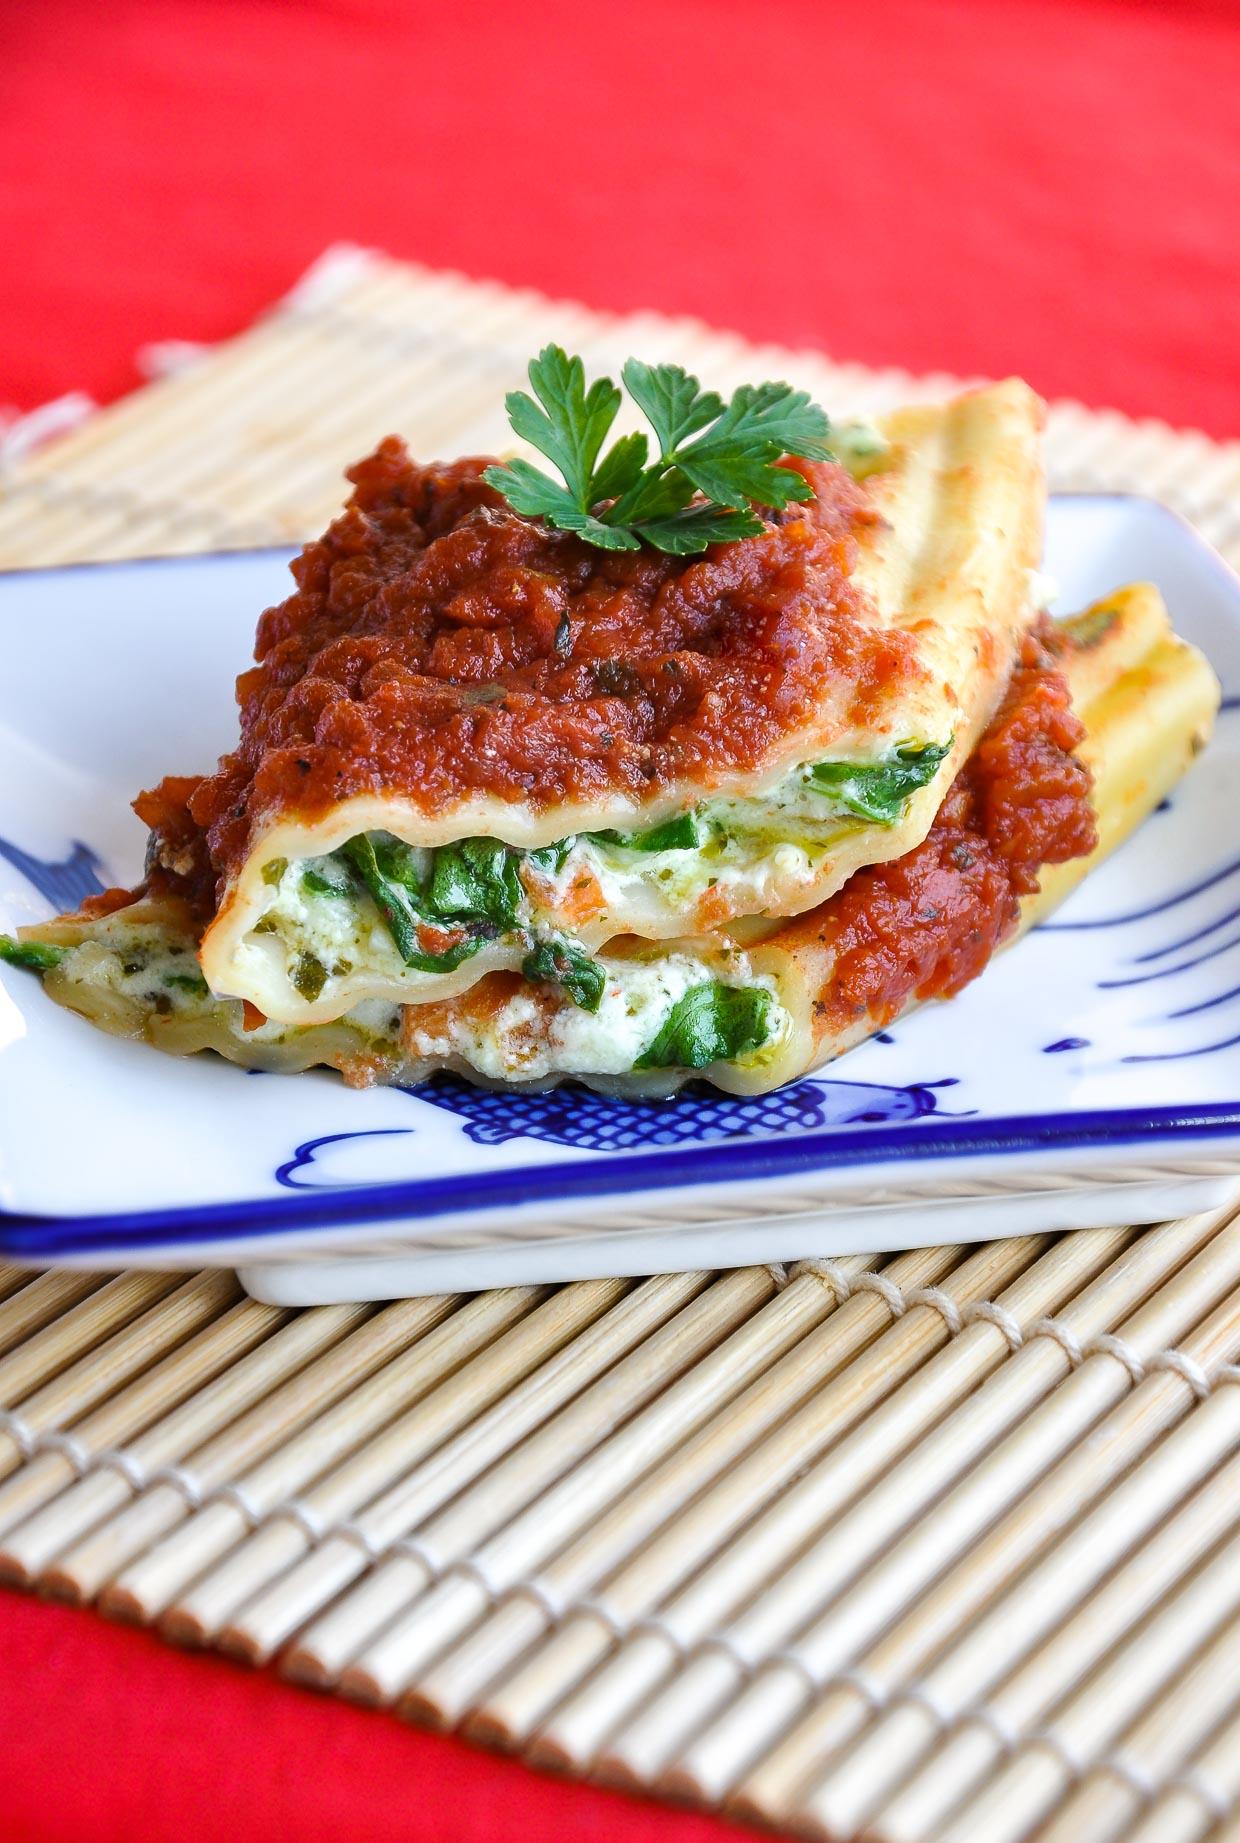 Vegetarian Pesto Veggie Manicotti